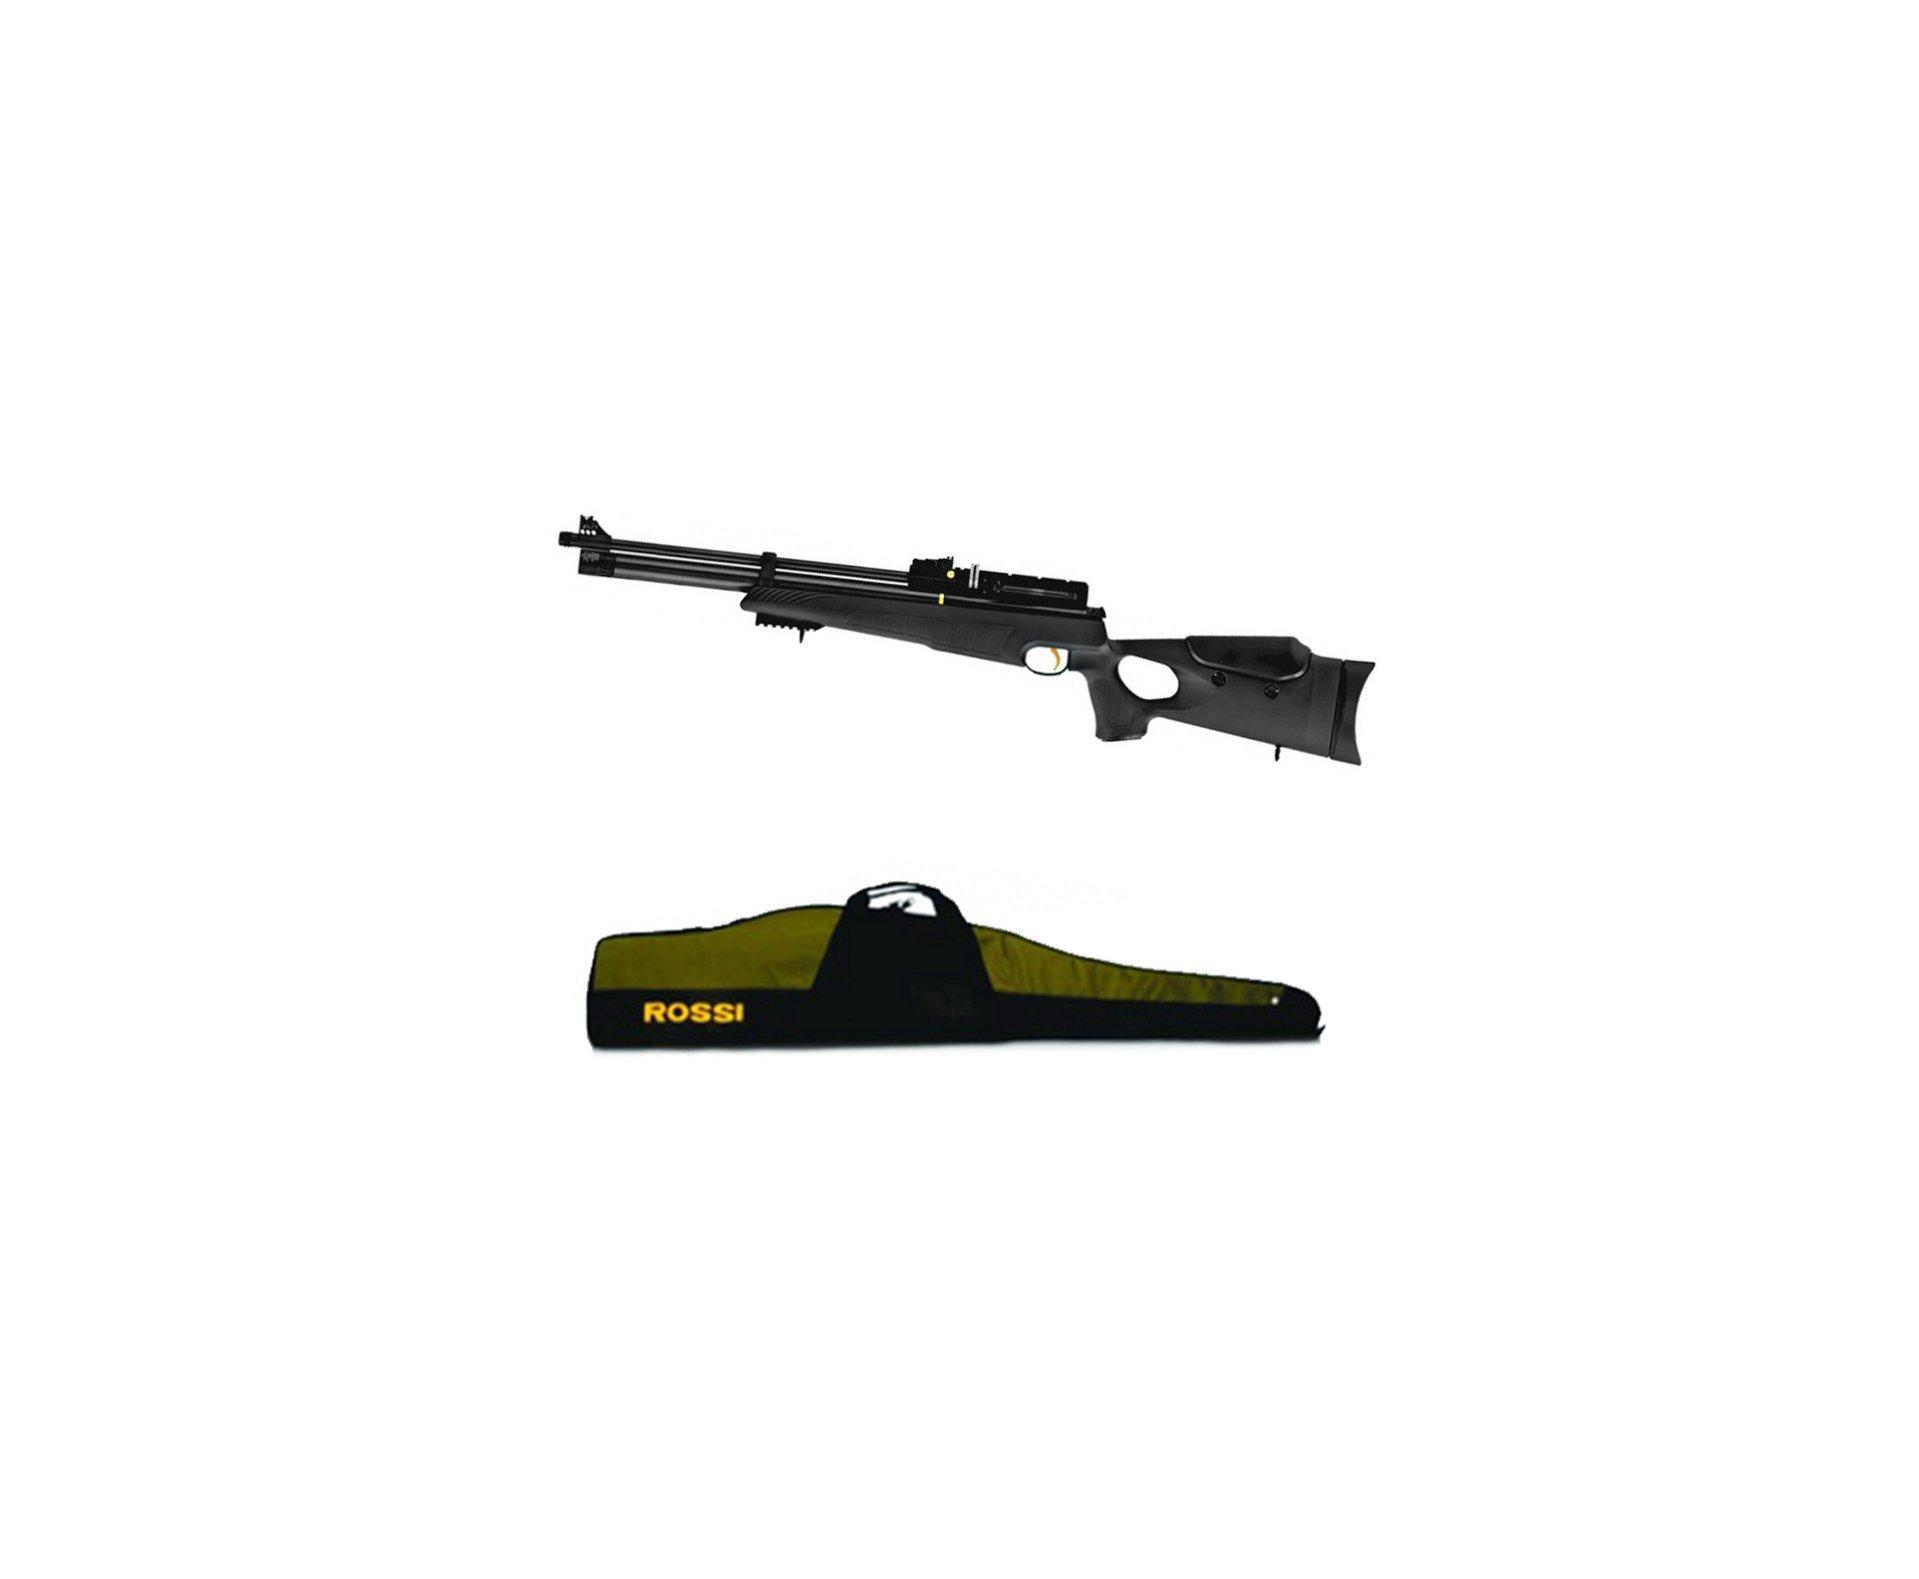 Carabina Pcp Hatsan At44-10 5,5 + Capa + 02 Cilindro Extra + Bomba Hand Pump